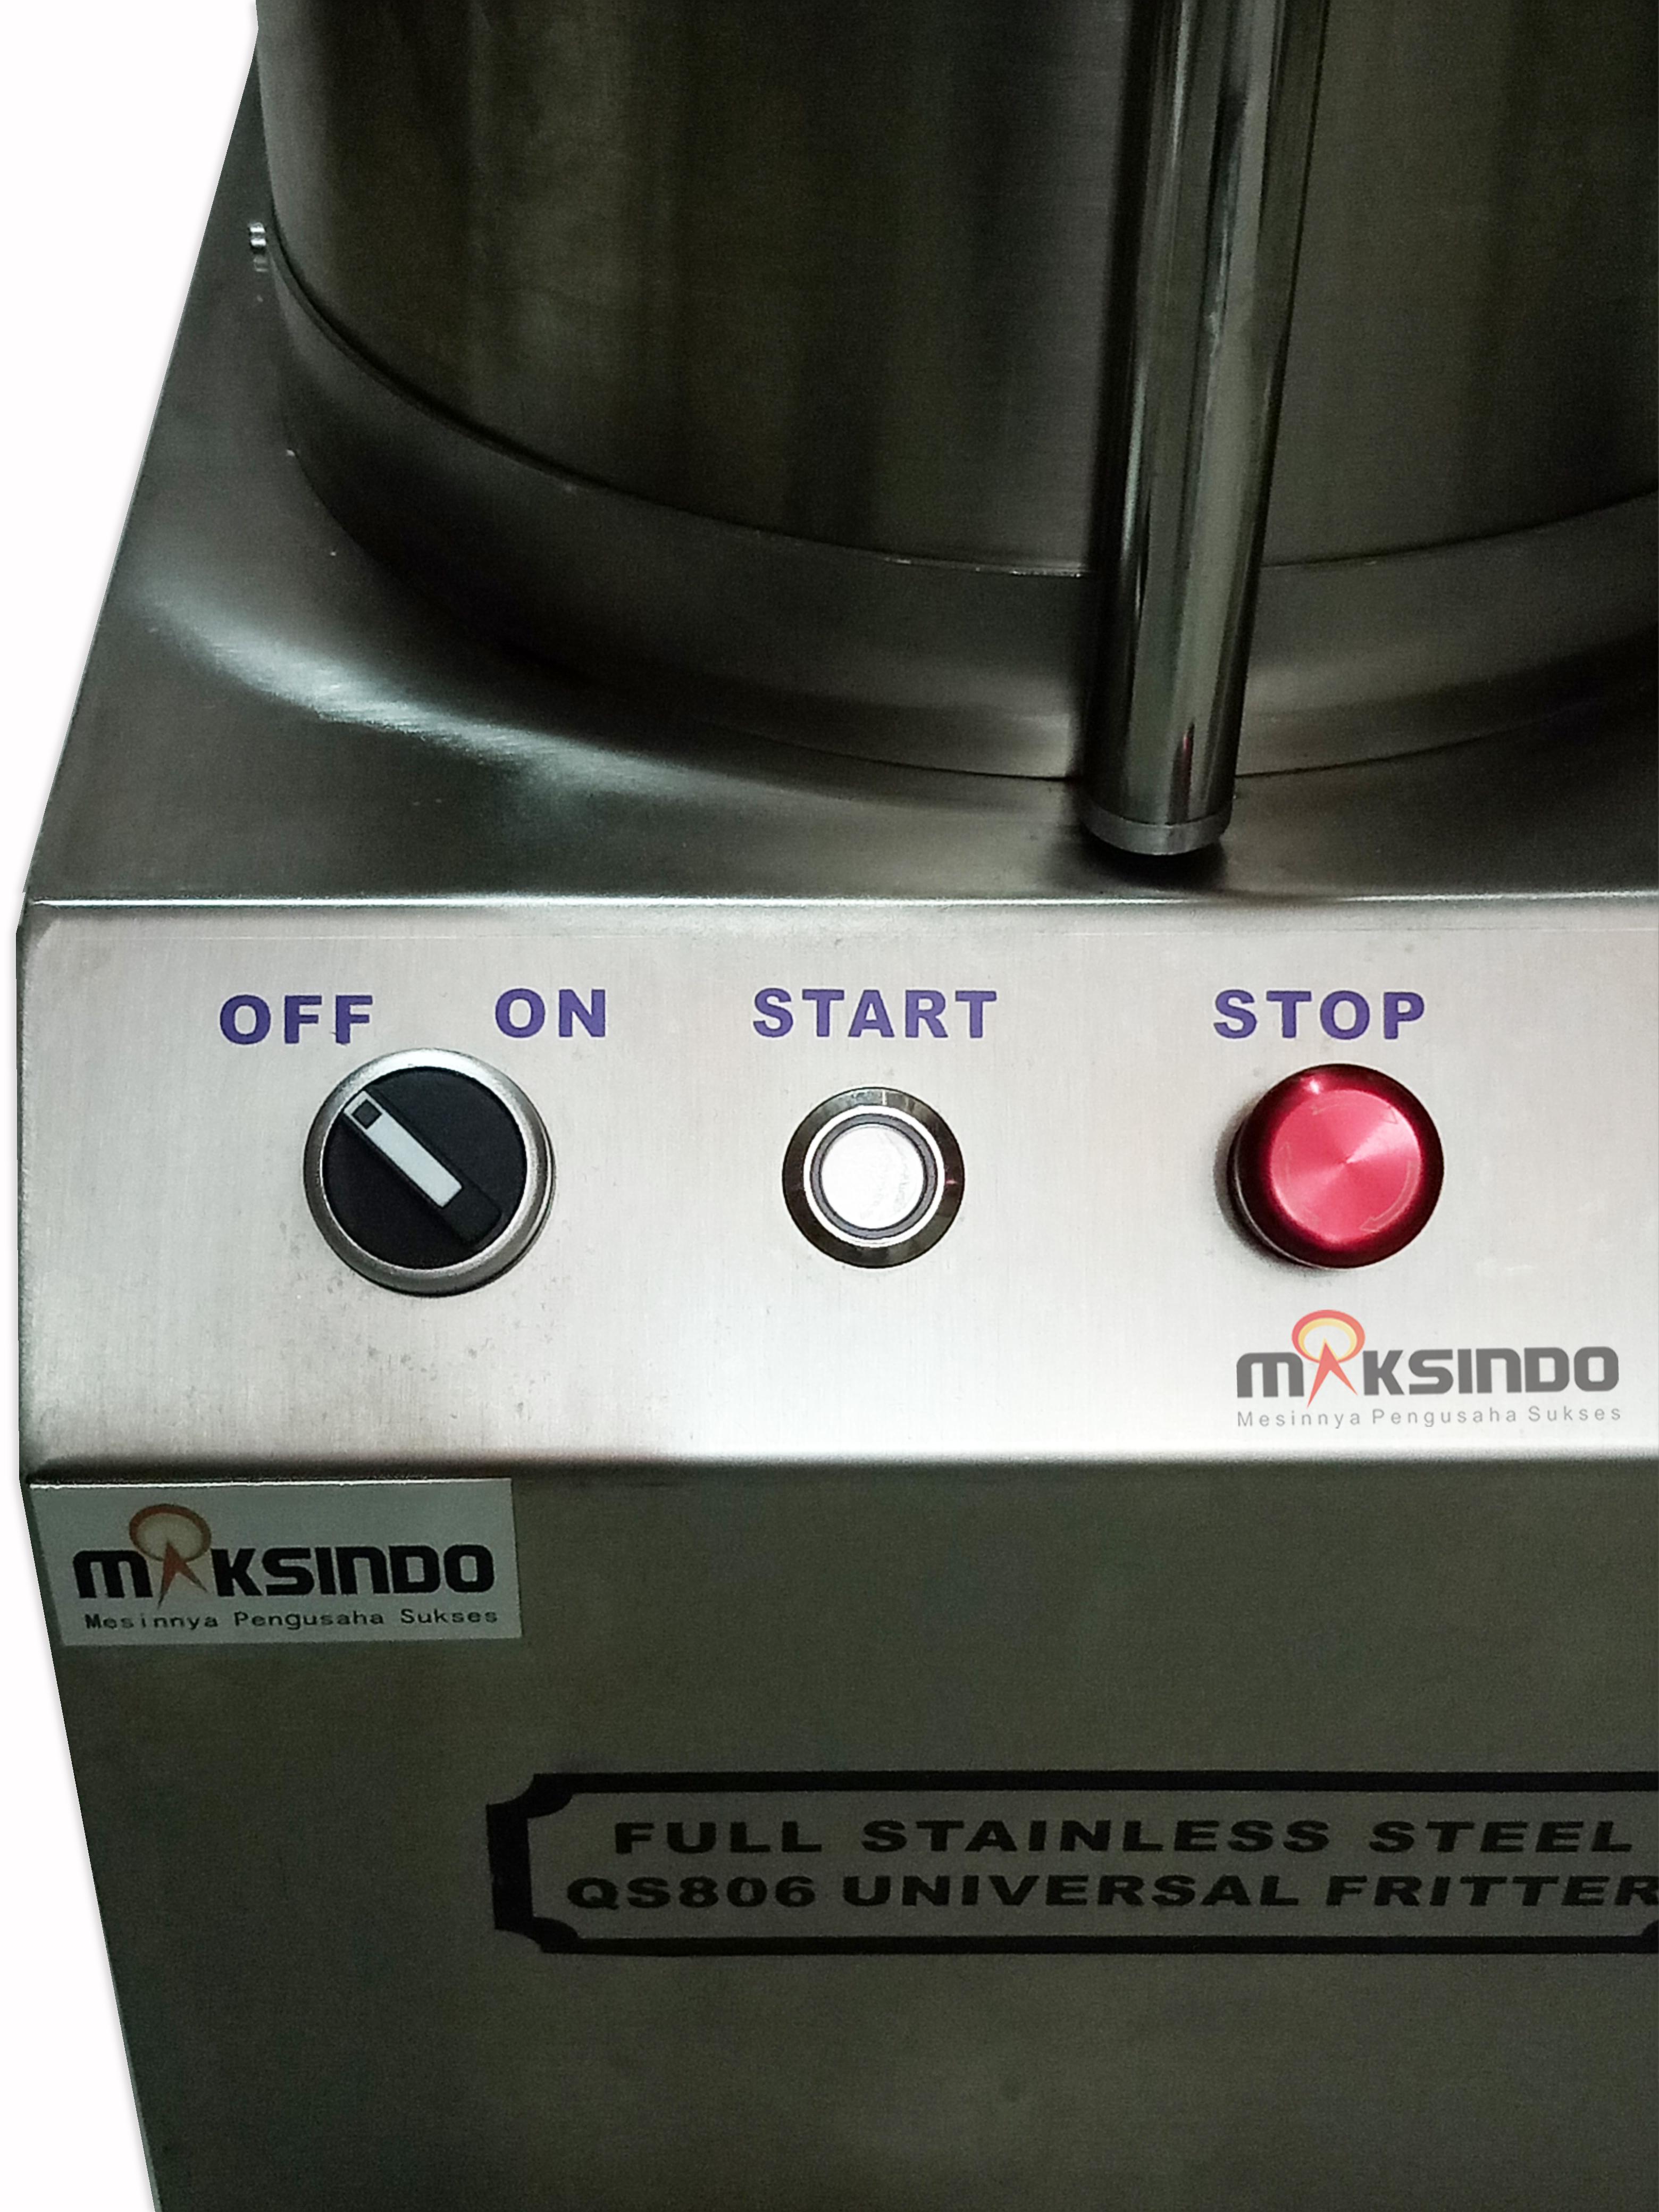 Jual Universal Fritter 4 Liter (MKS-UV4A) di Bandung